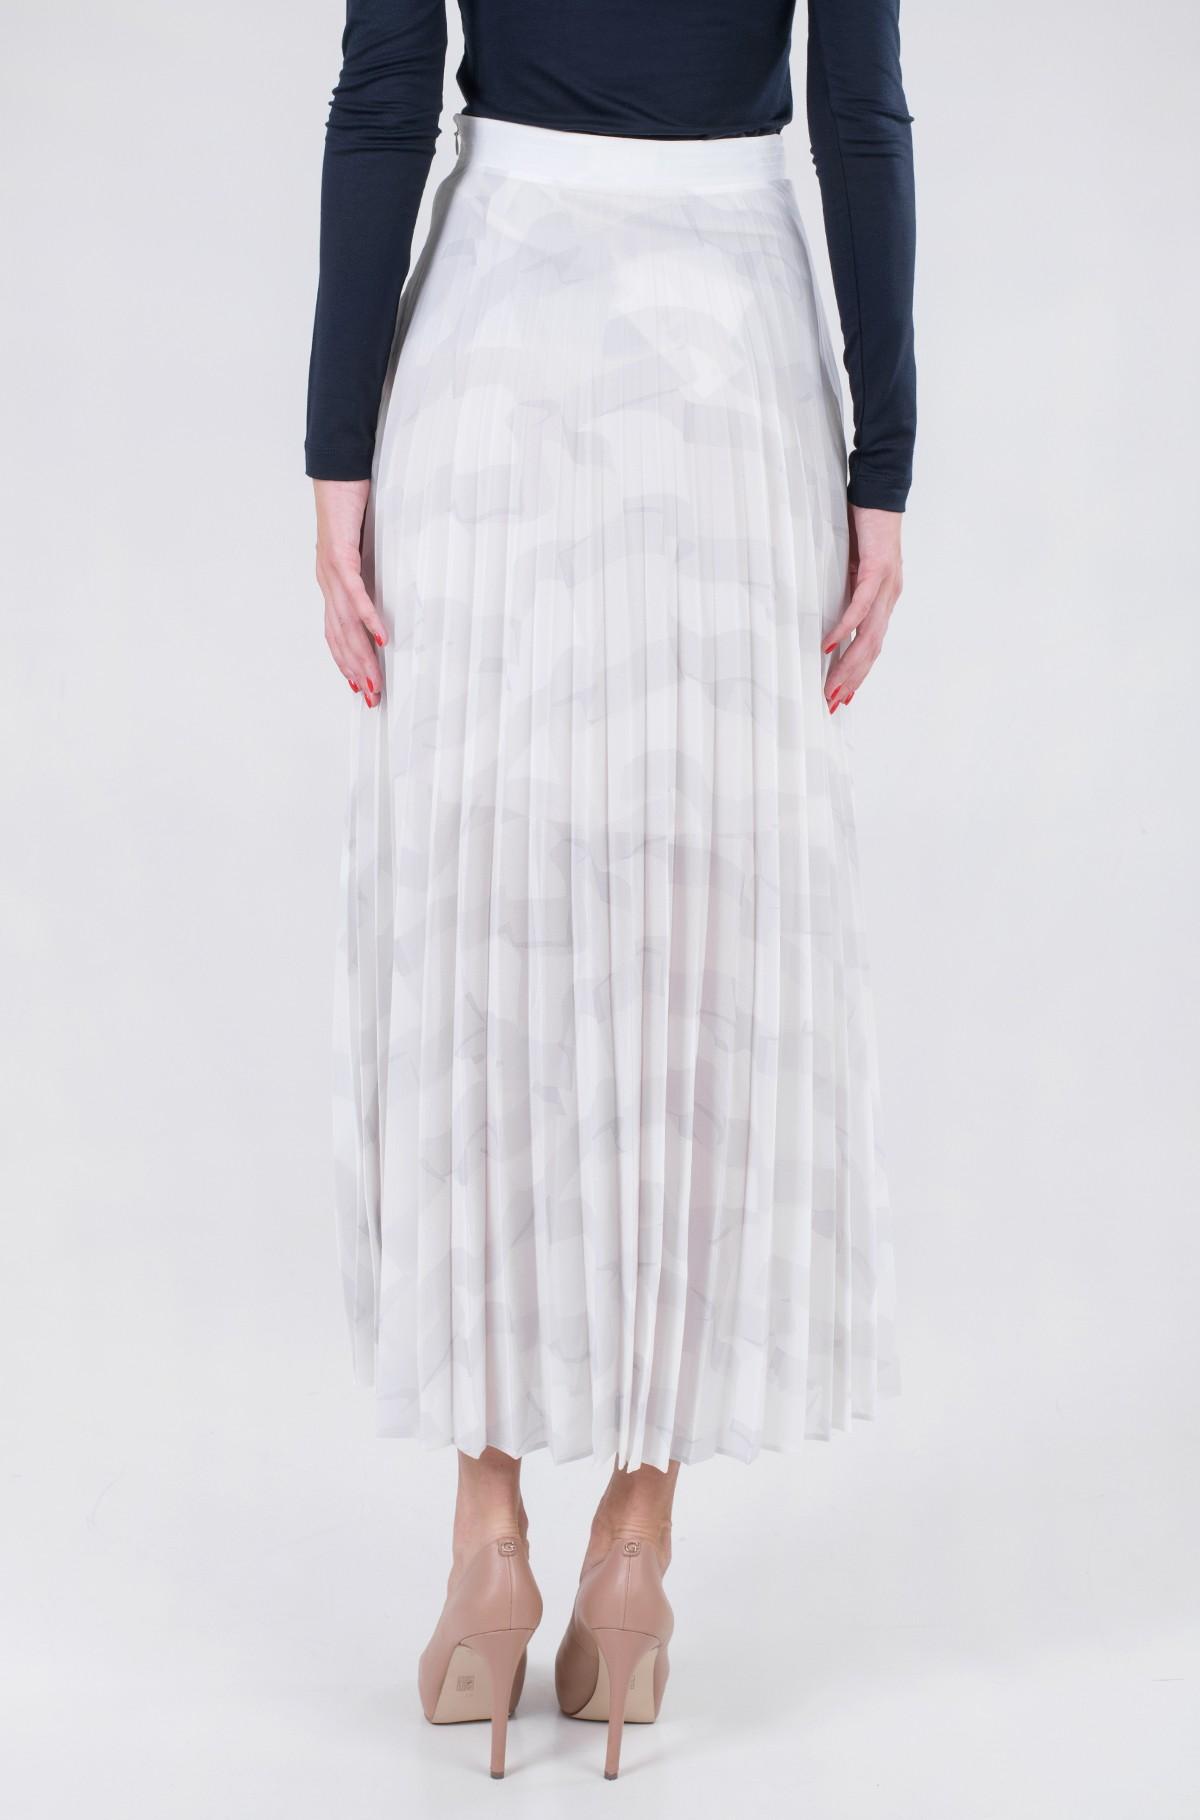 Skirt ICON CHIFFON PLEATED LONG SKIRT-full-2